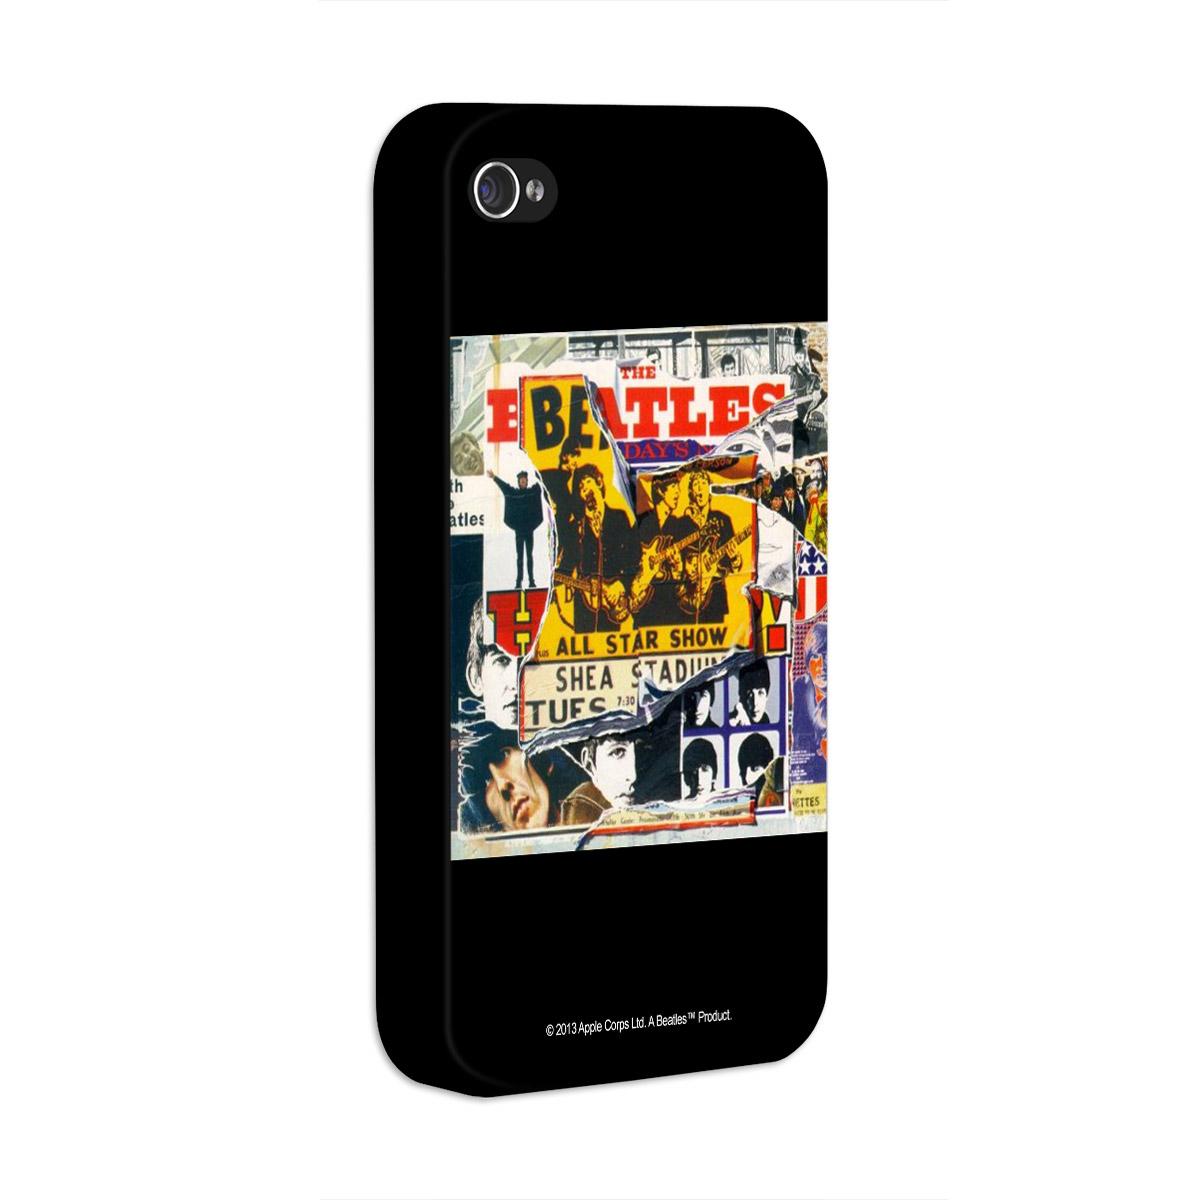 Capa de iPhone 4/4S The Beatles Anthology II